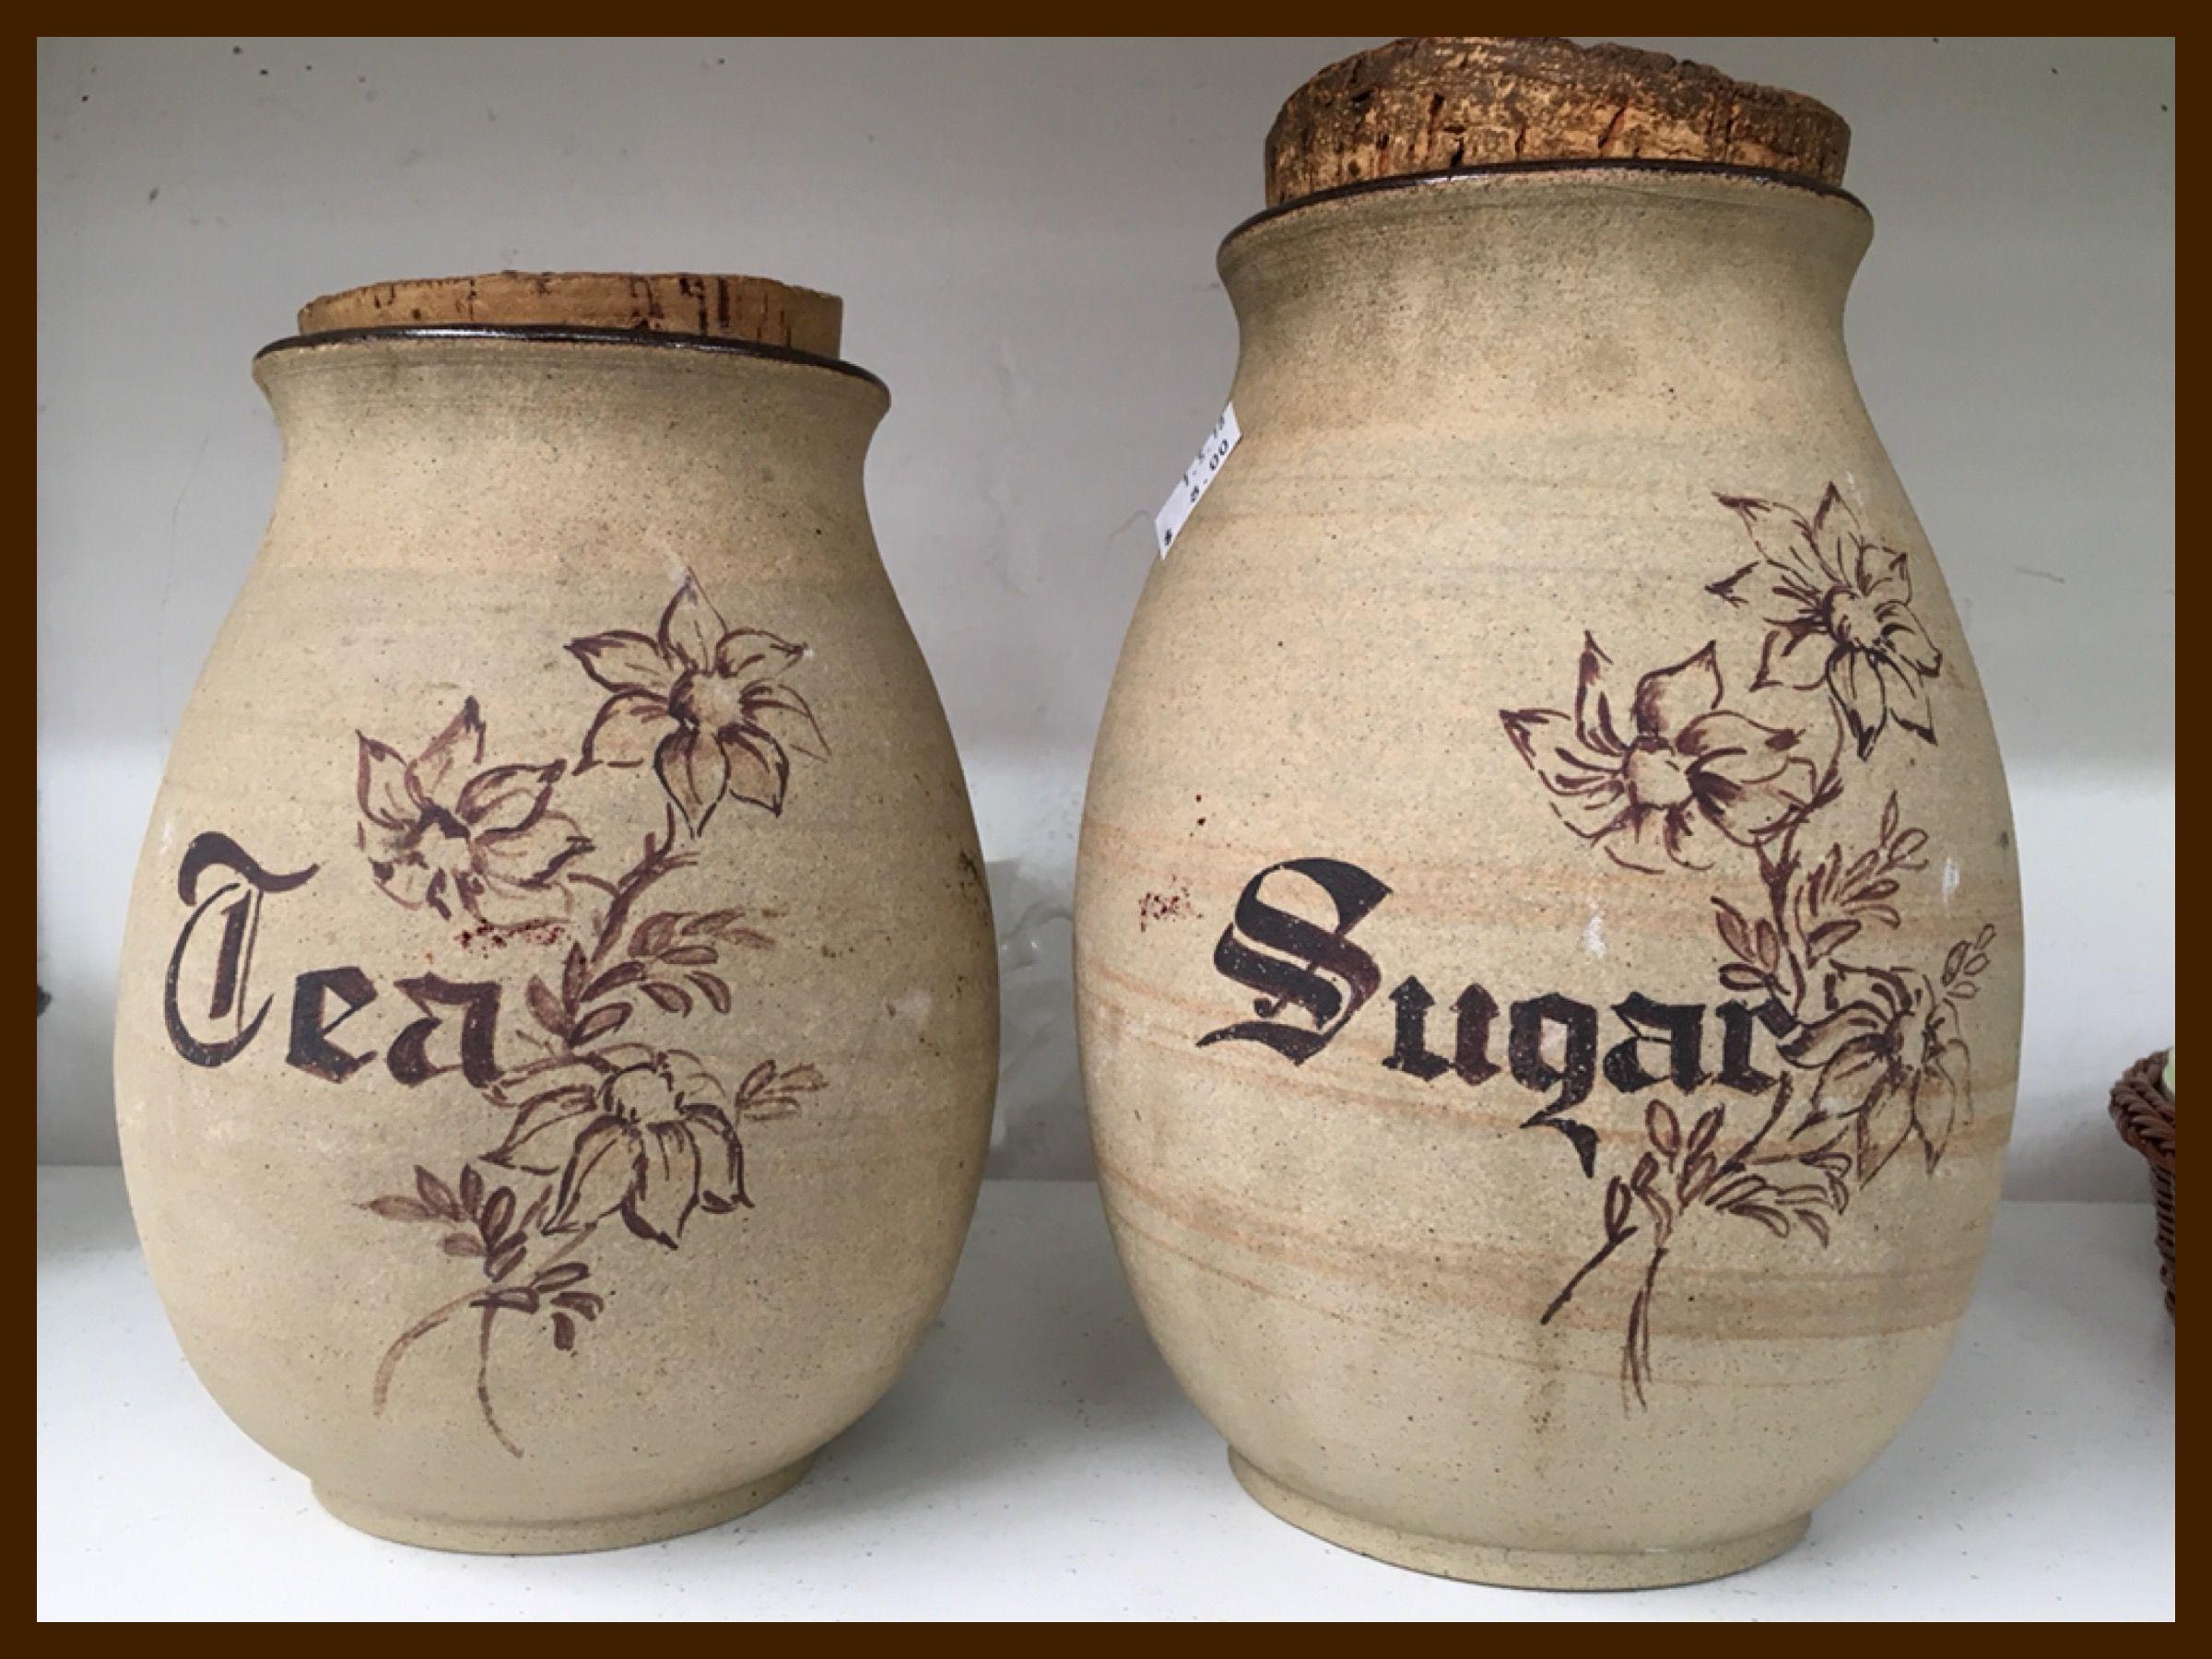 Bulls hill tea and sugar jars pottery tea